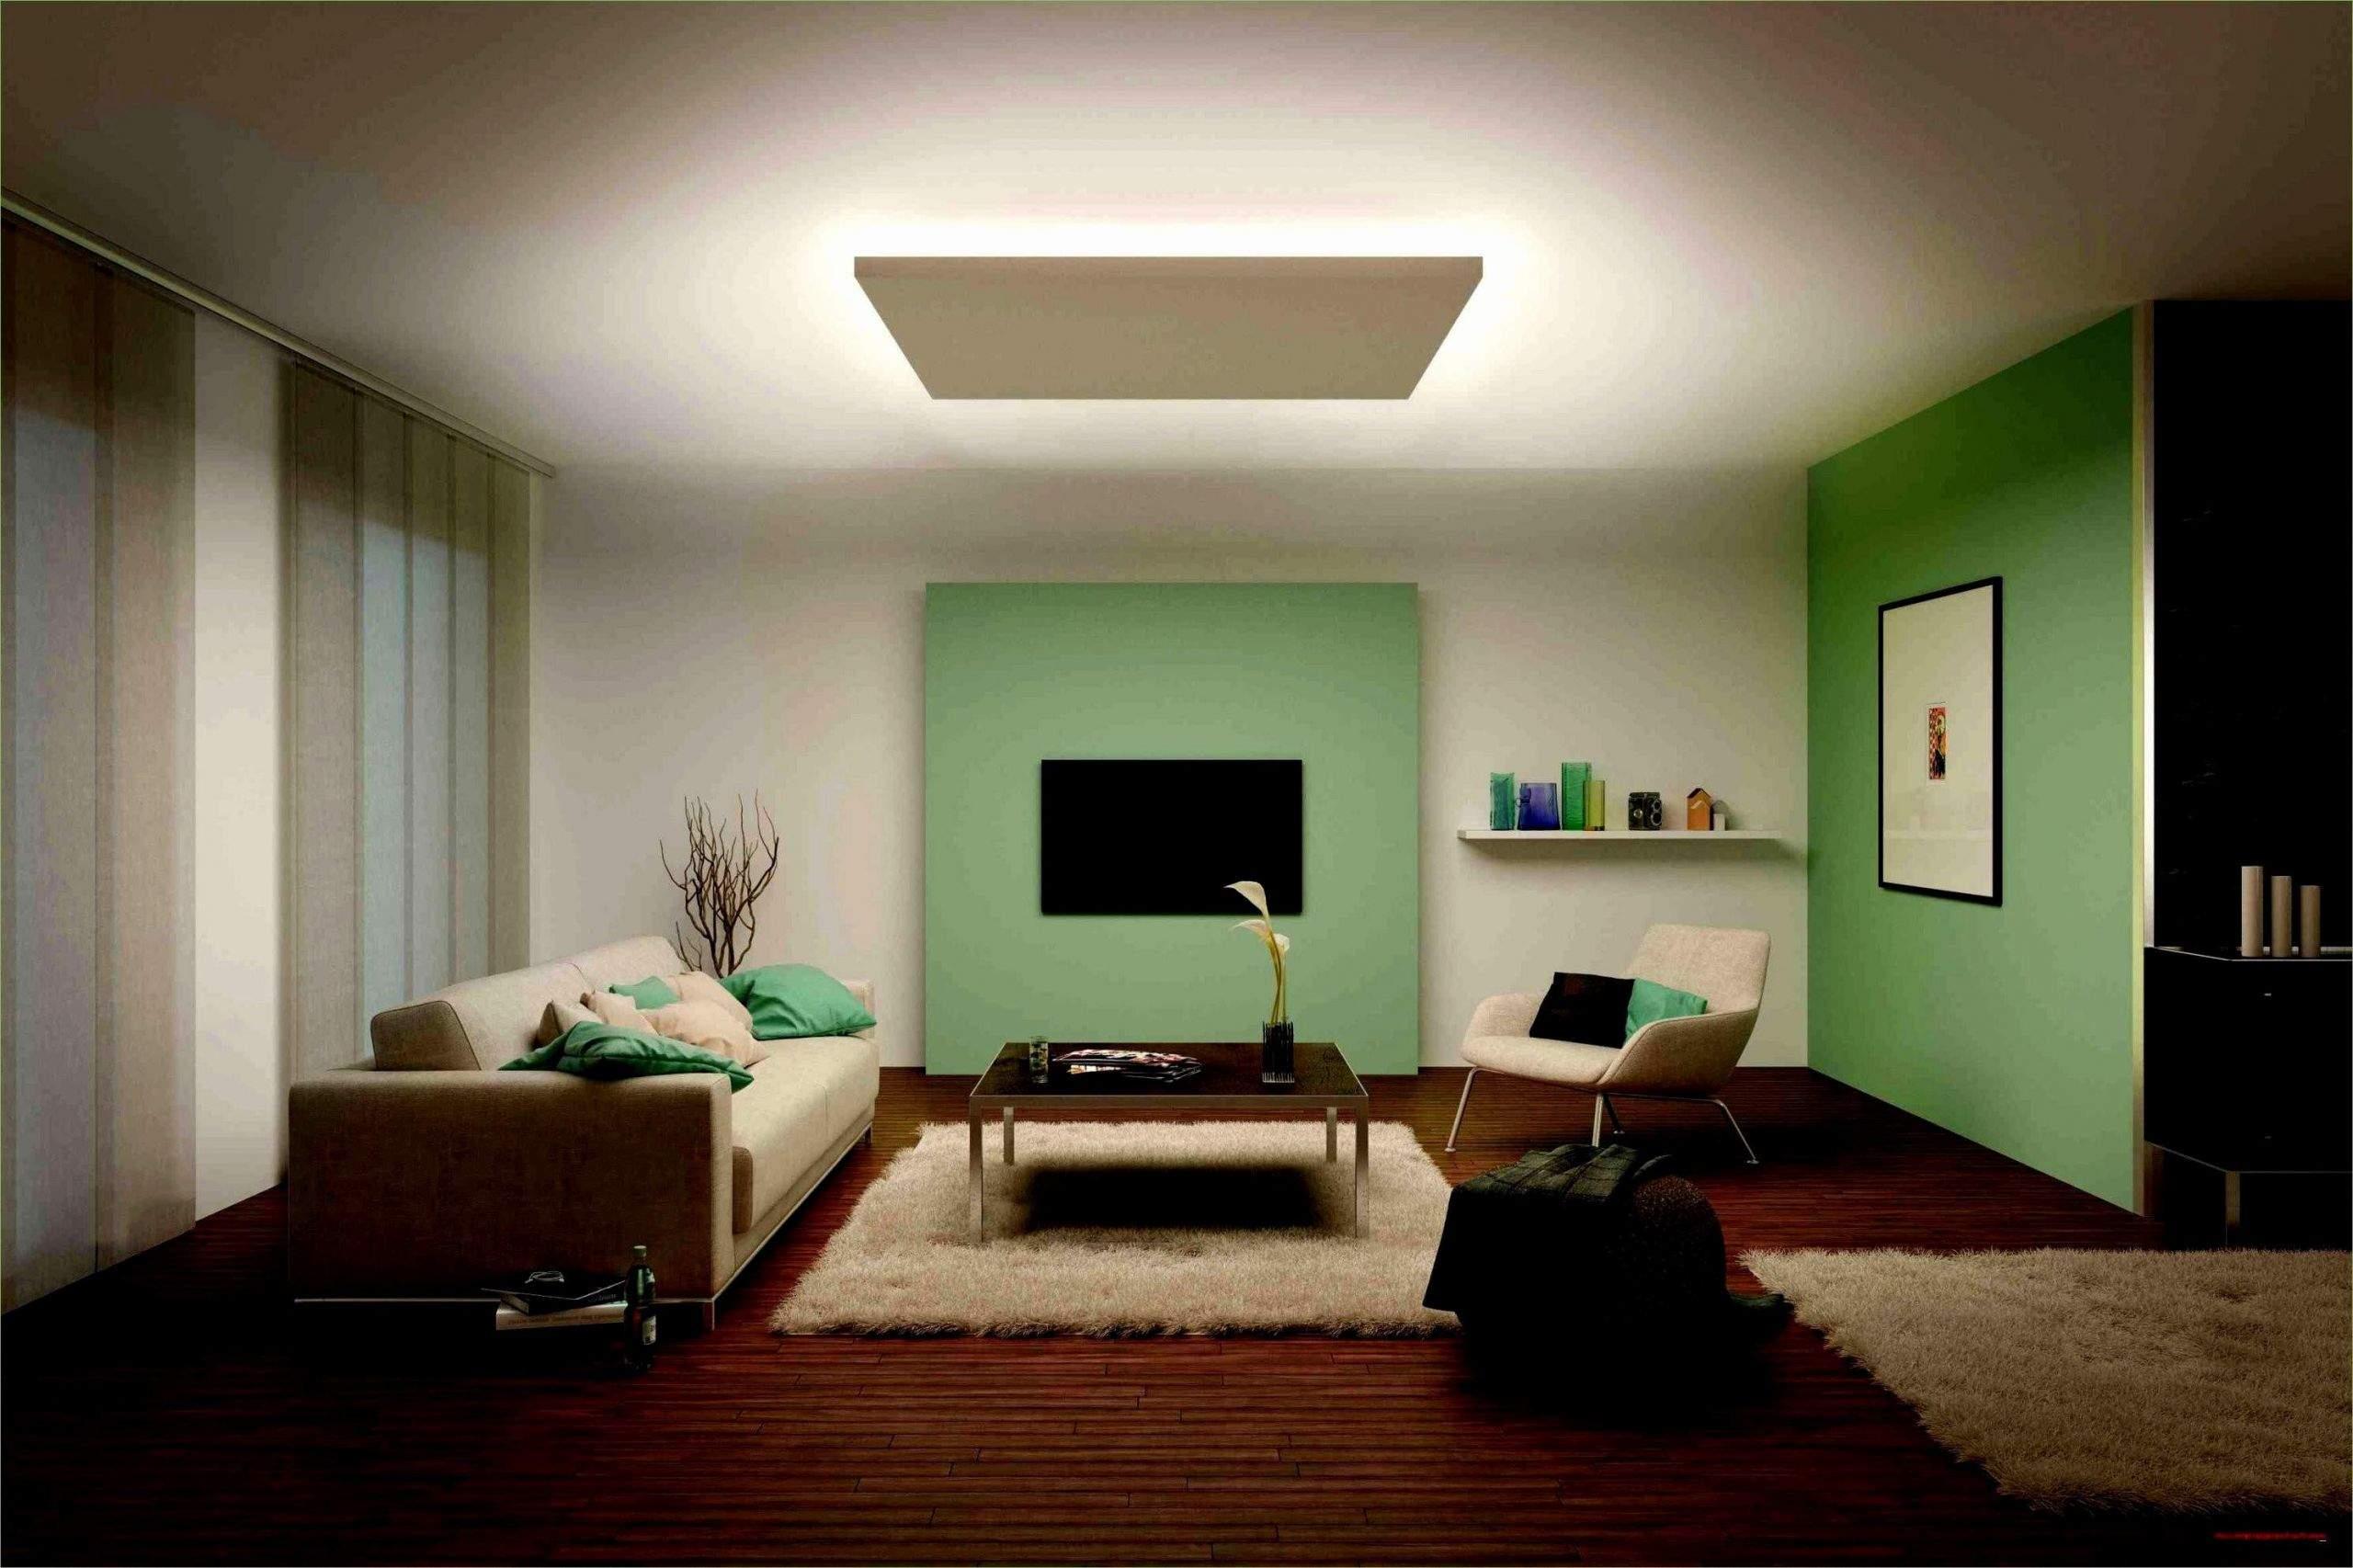 led beleuchtung wohnzimmer elegant lampen wohnzimmer genial lampen wohnzimmer led led strahler of led beleuchtung wohnzimmer scaled